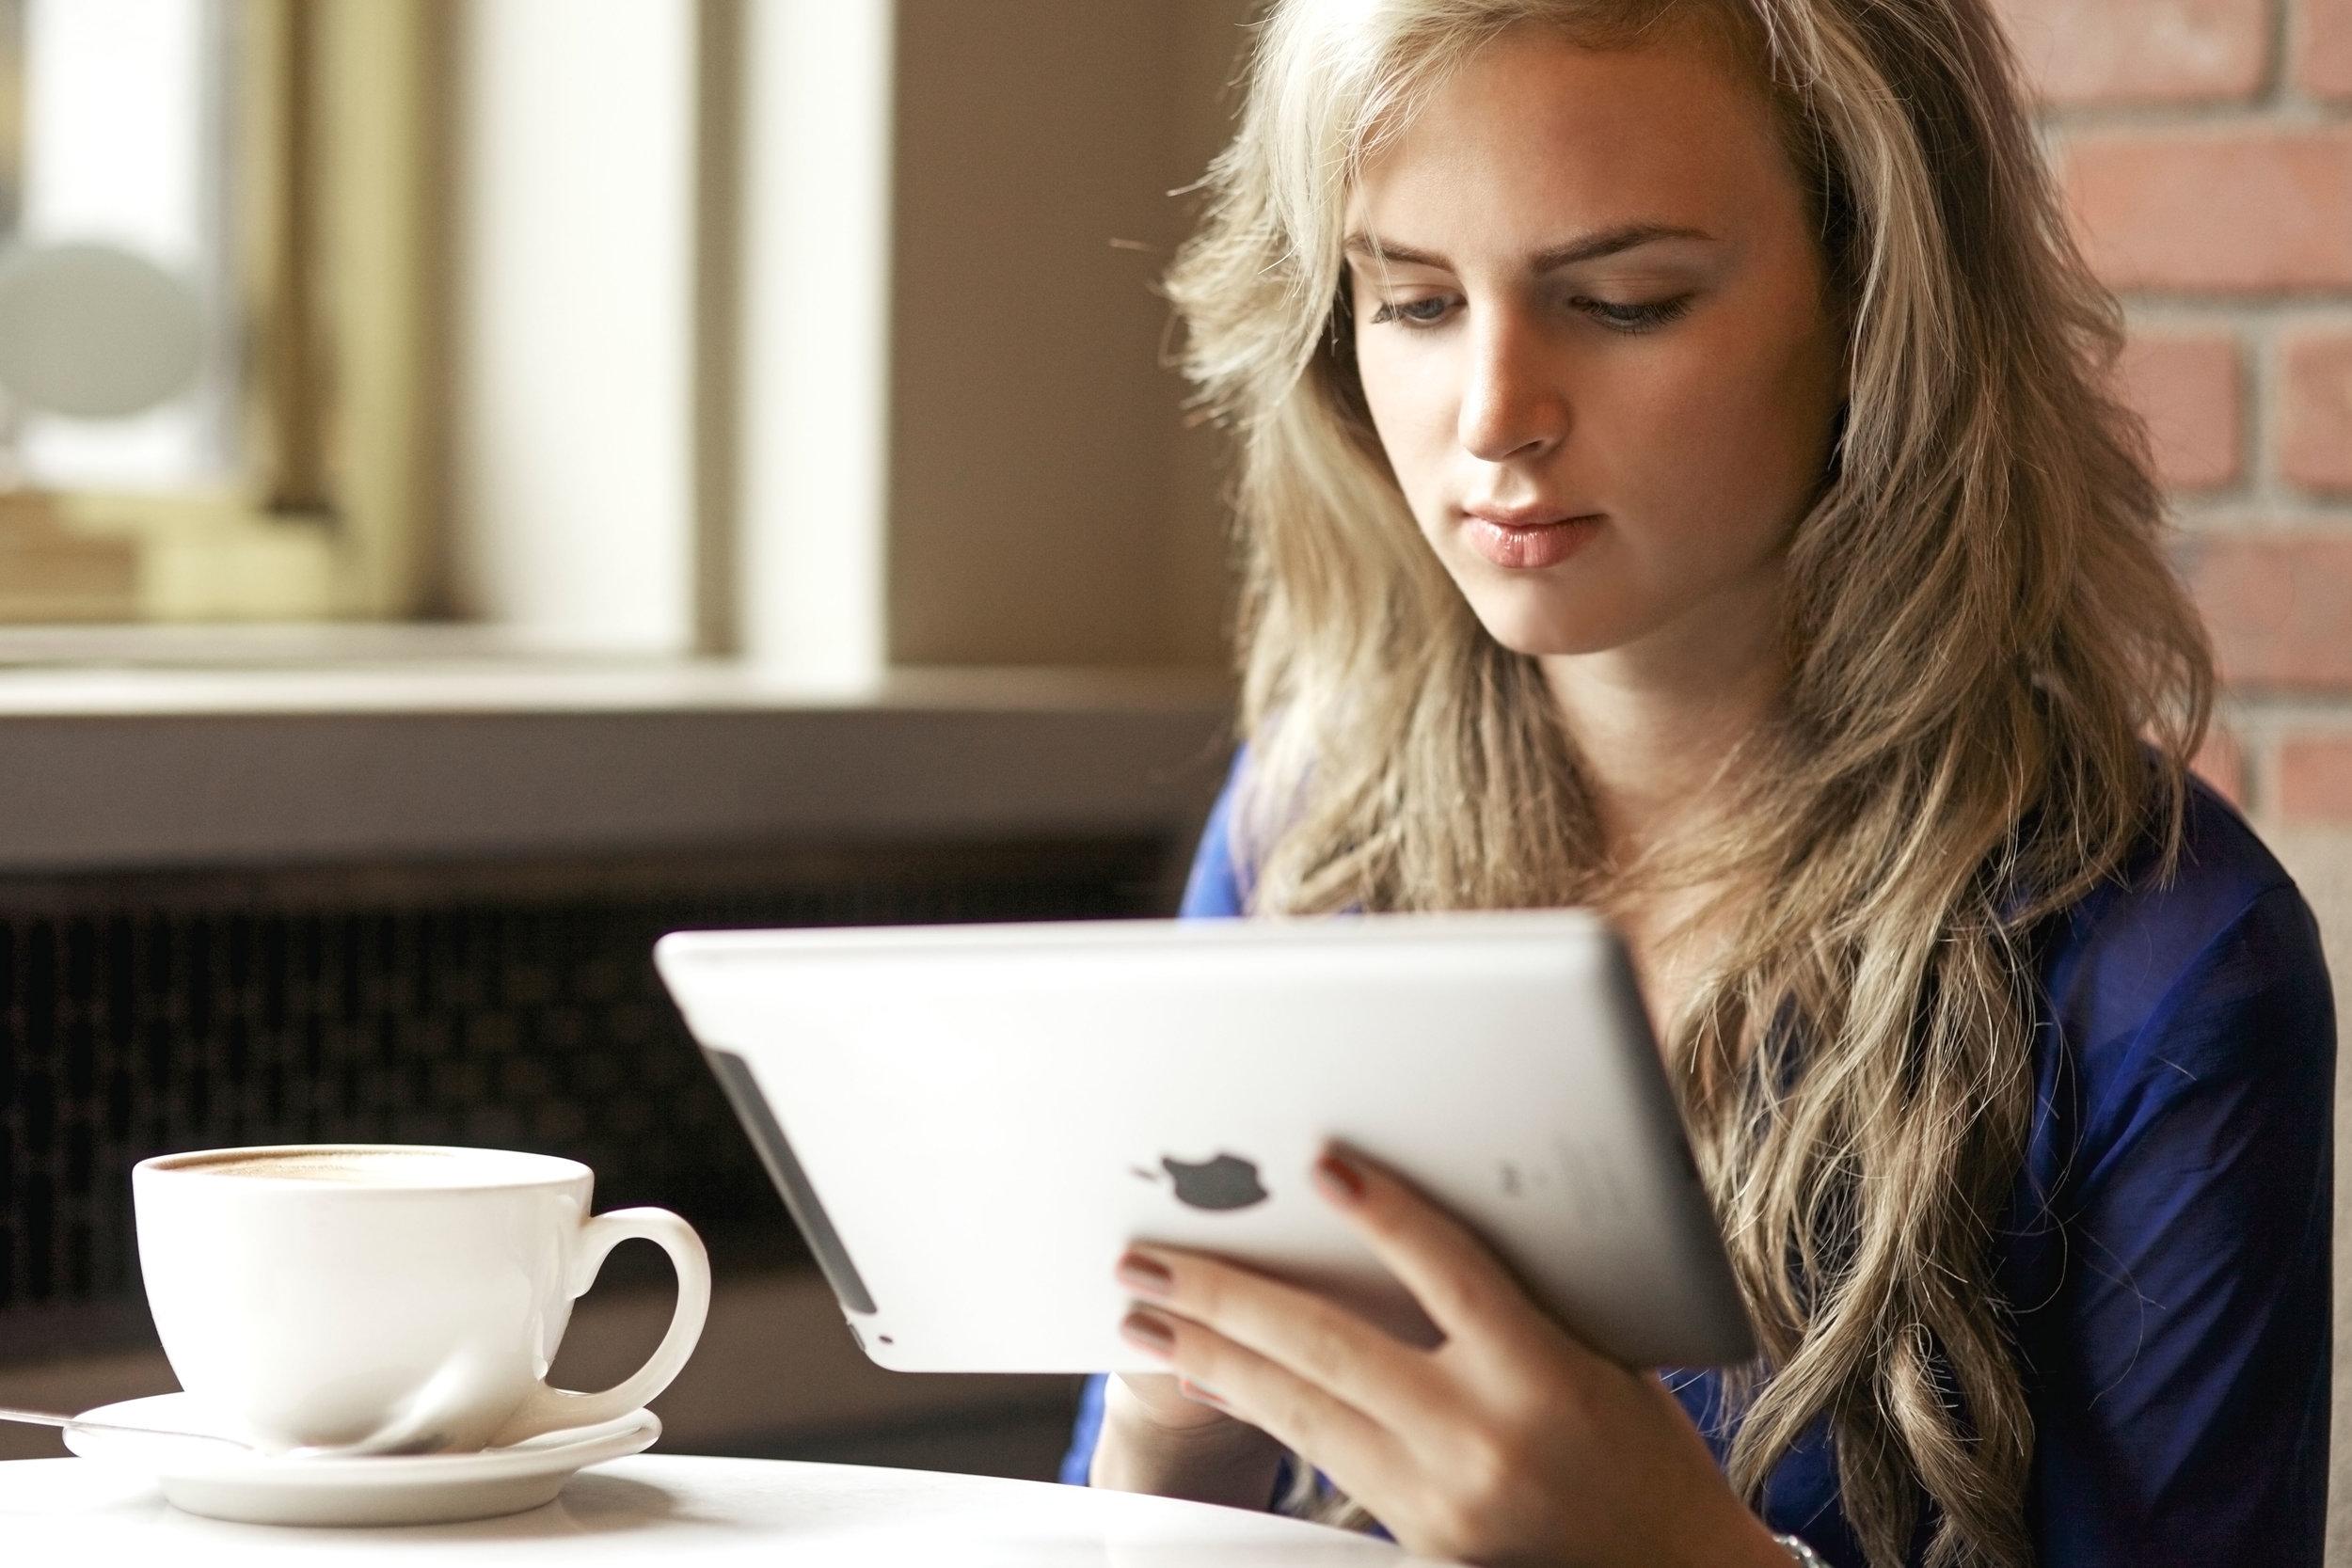 Woman on an iPad